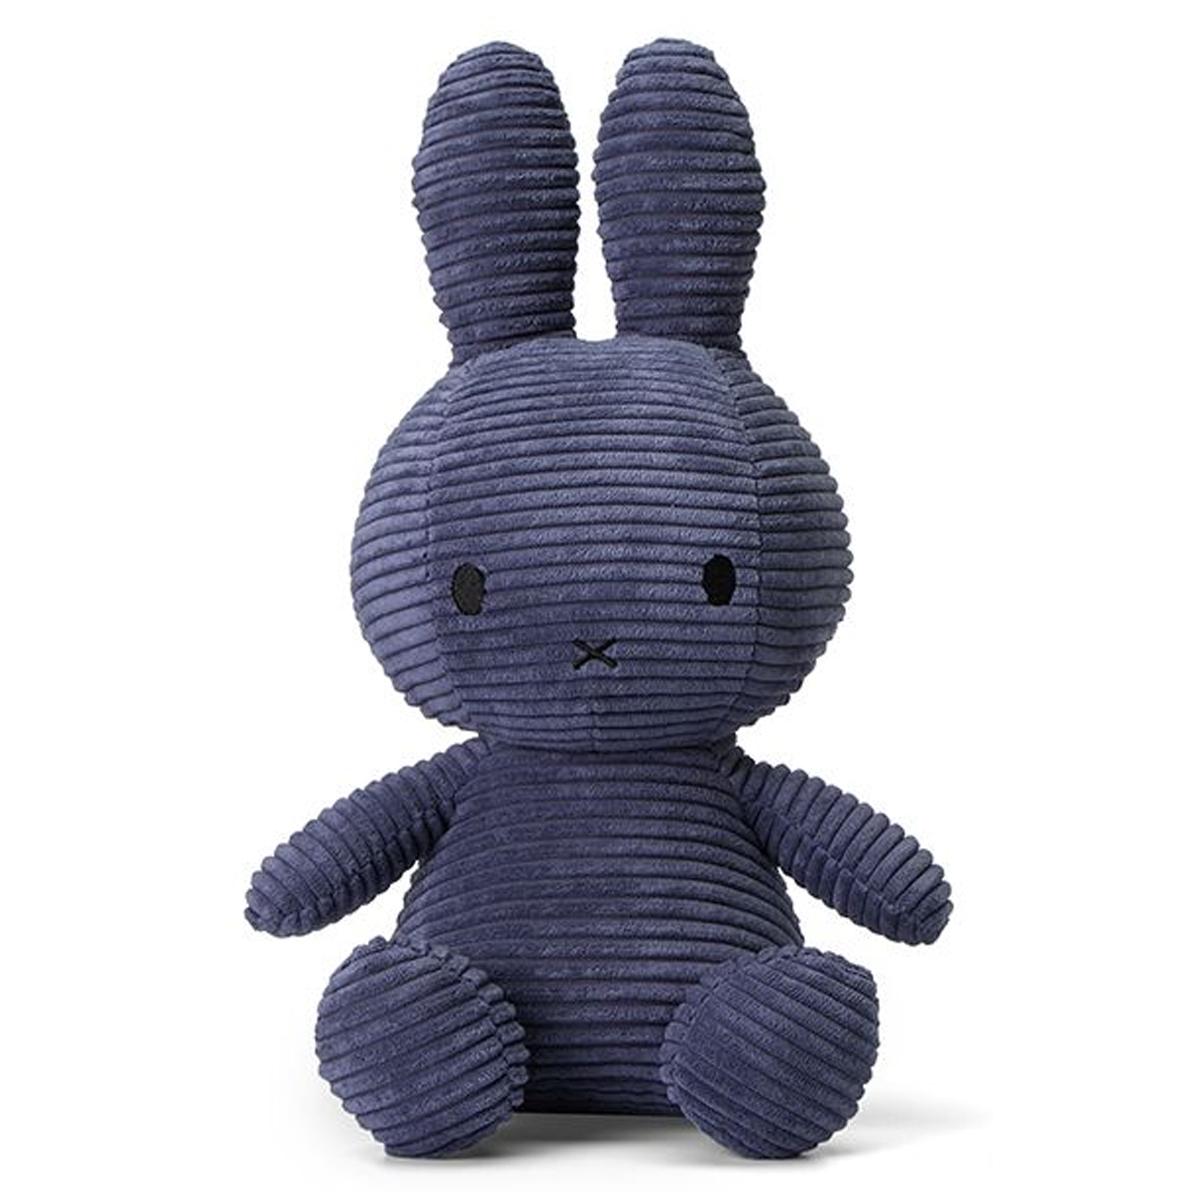 Peluche Peluche Lapin Miffy Bleu Nuit - Moyen Peluche Lapin Miffy Bleu Nuit 33 cm